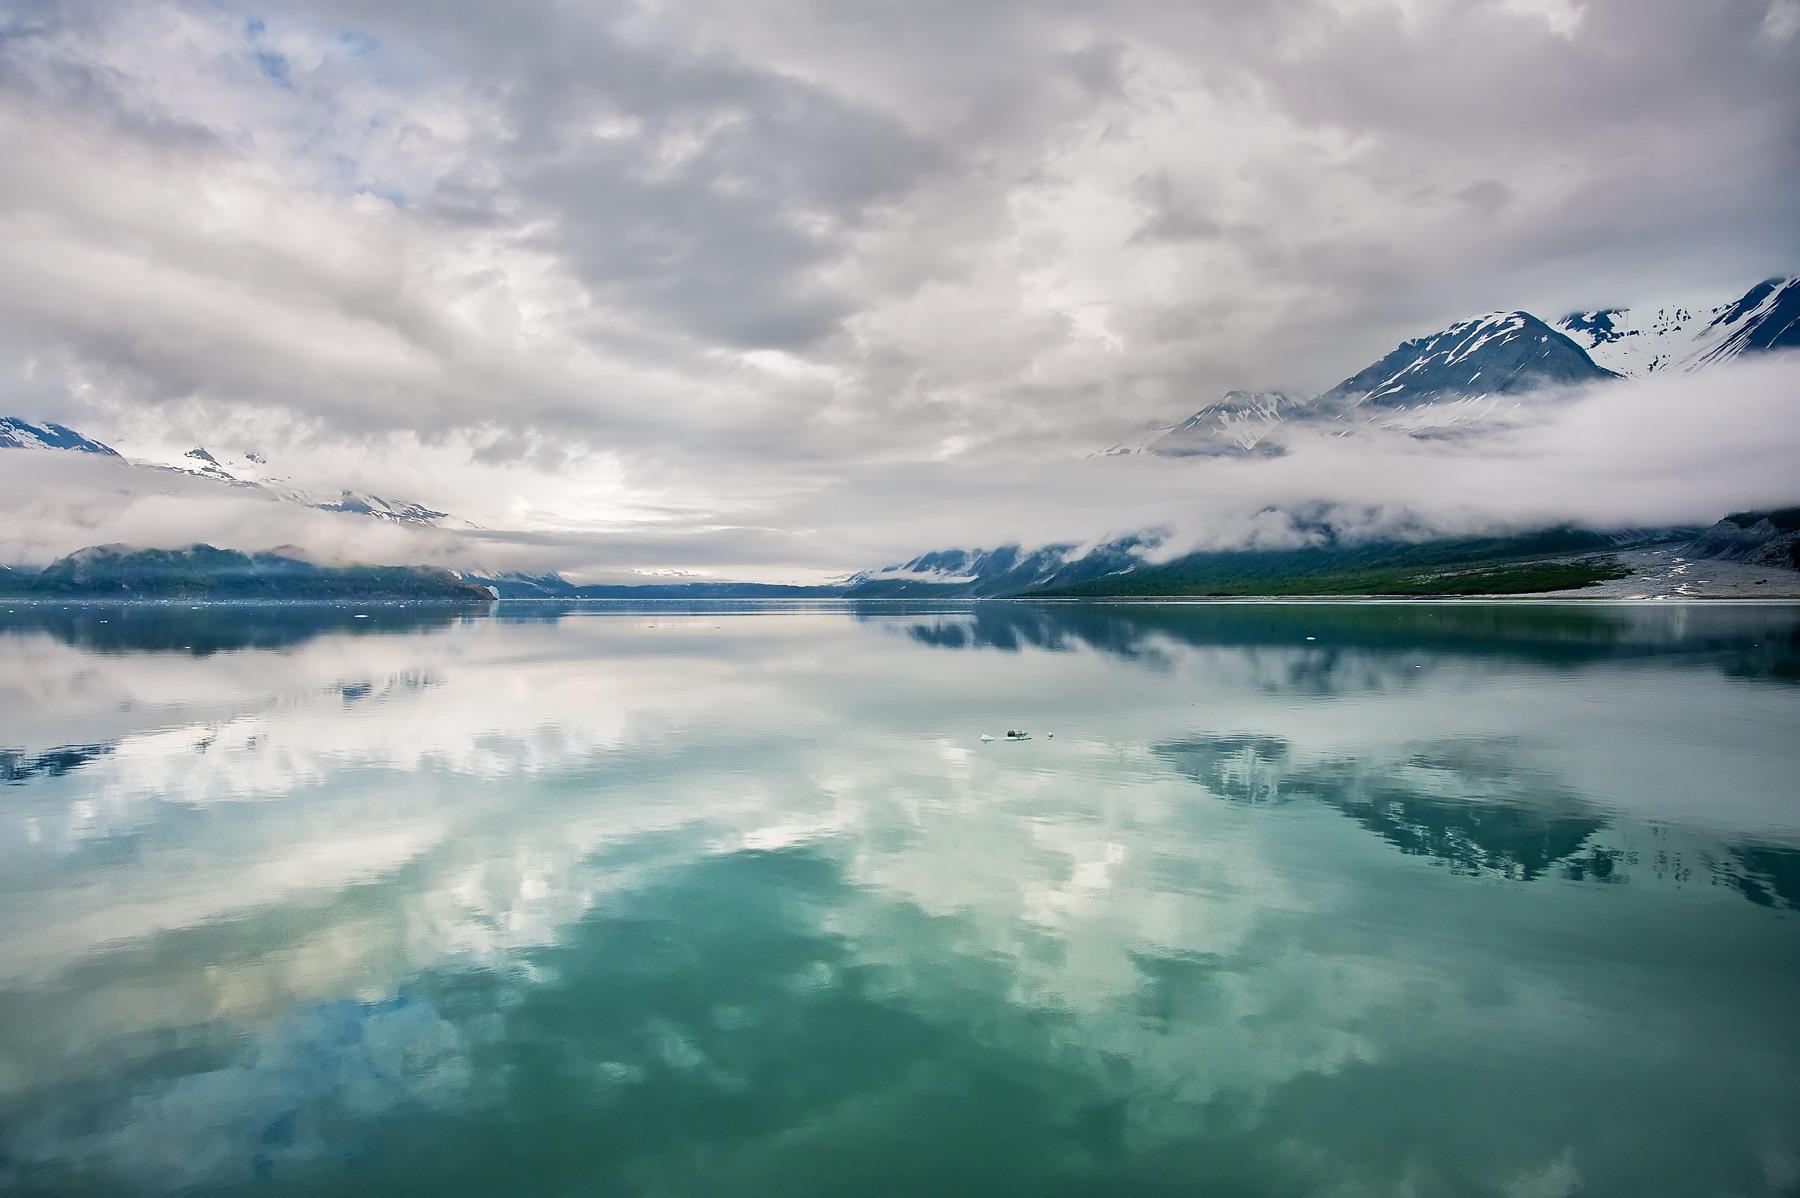 GlacierBay_Pastel_Reflections_alaska.jpg